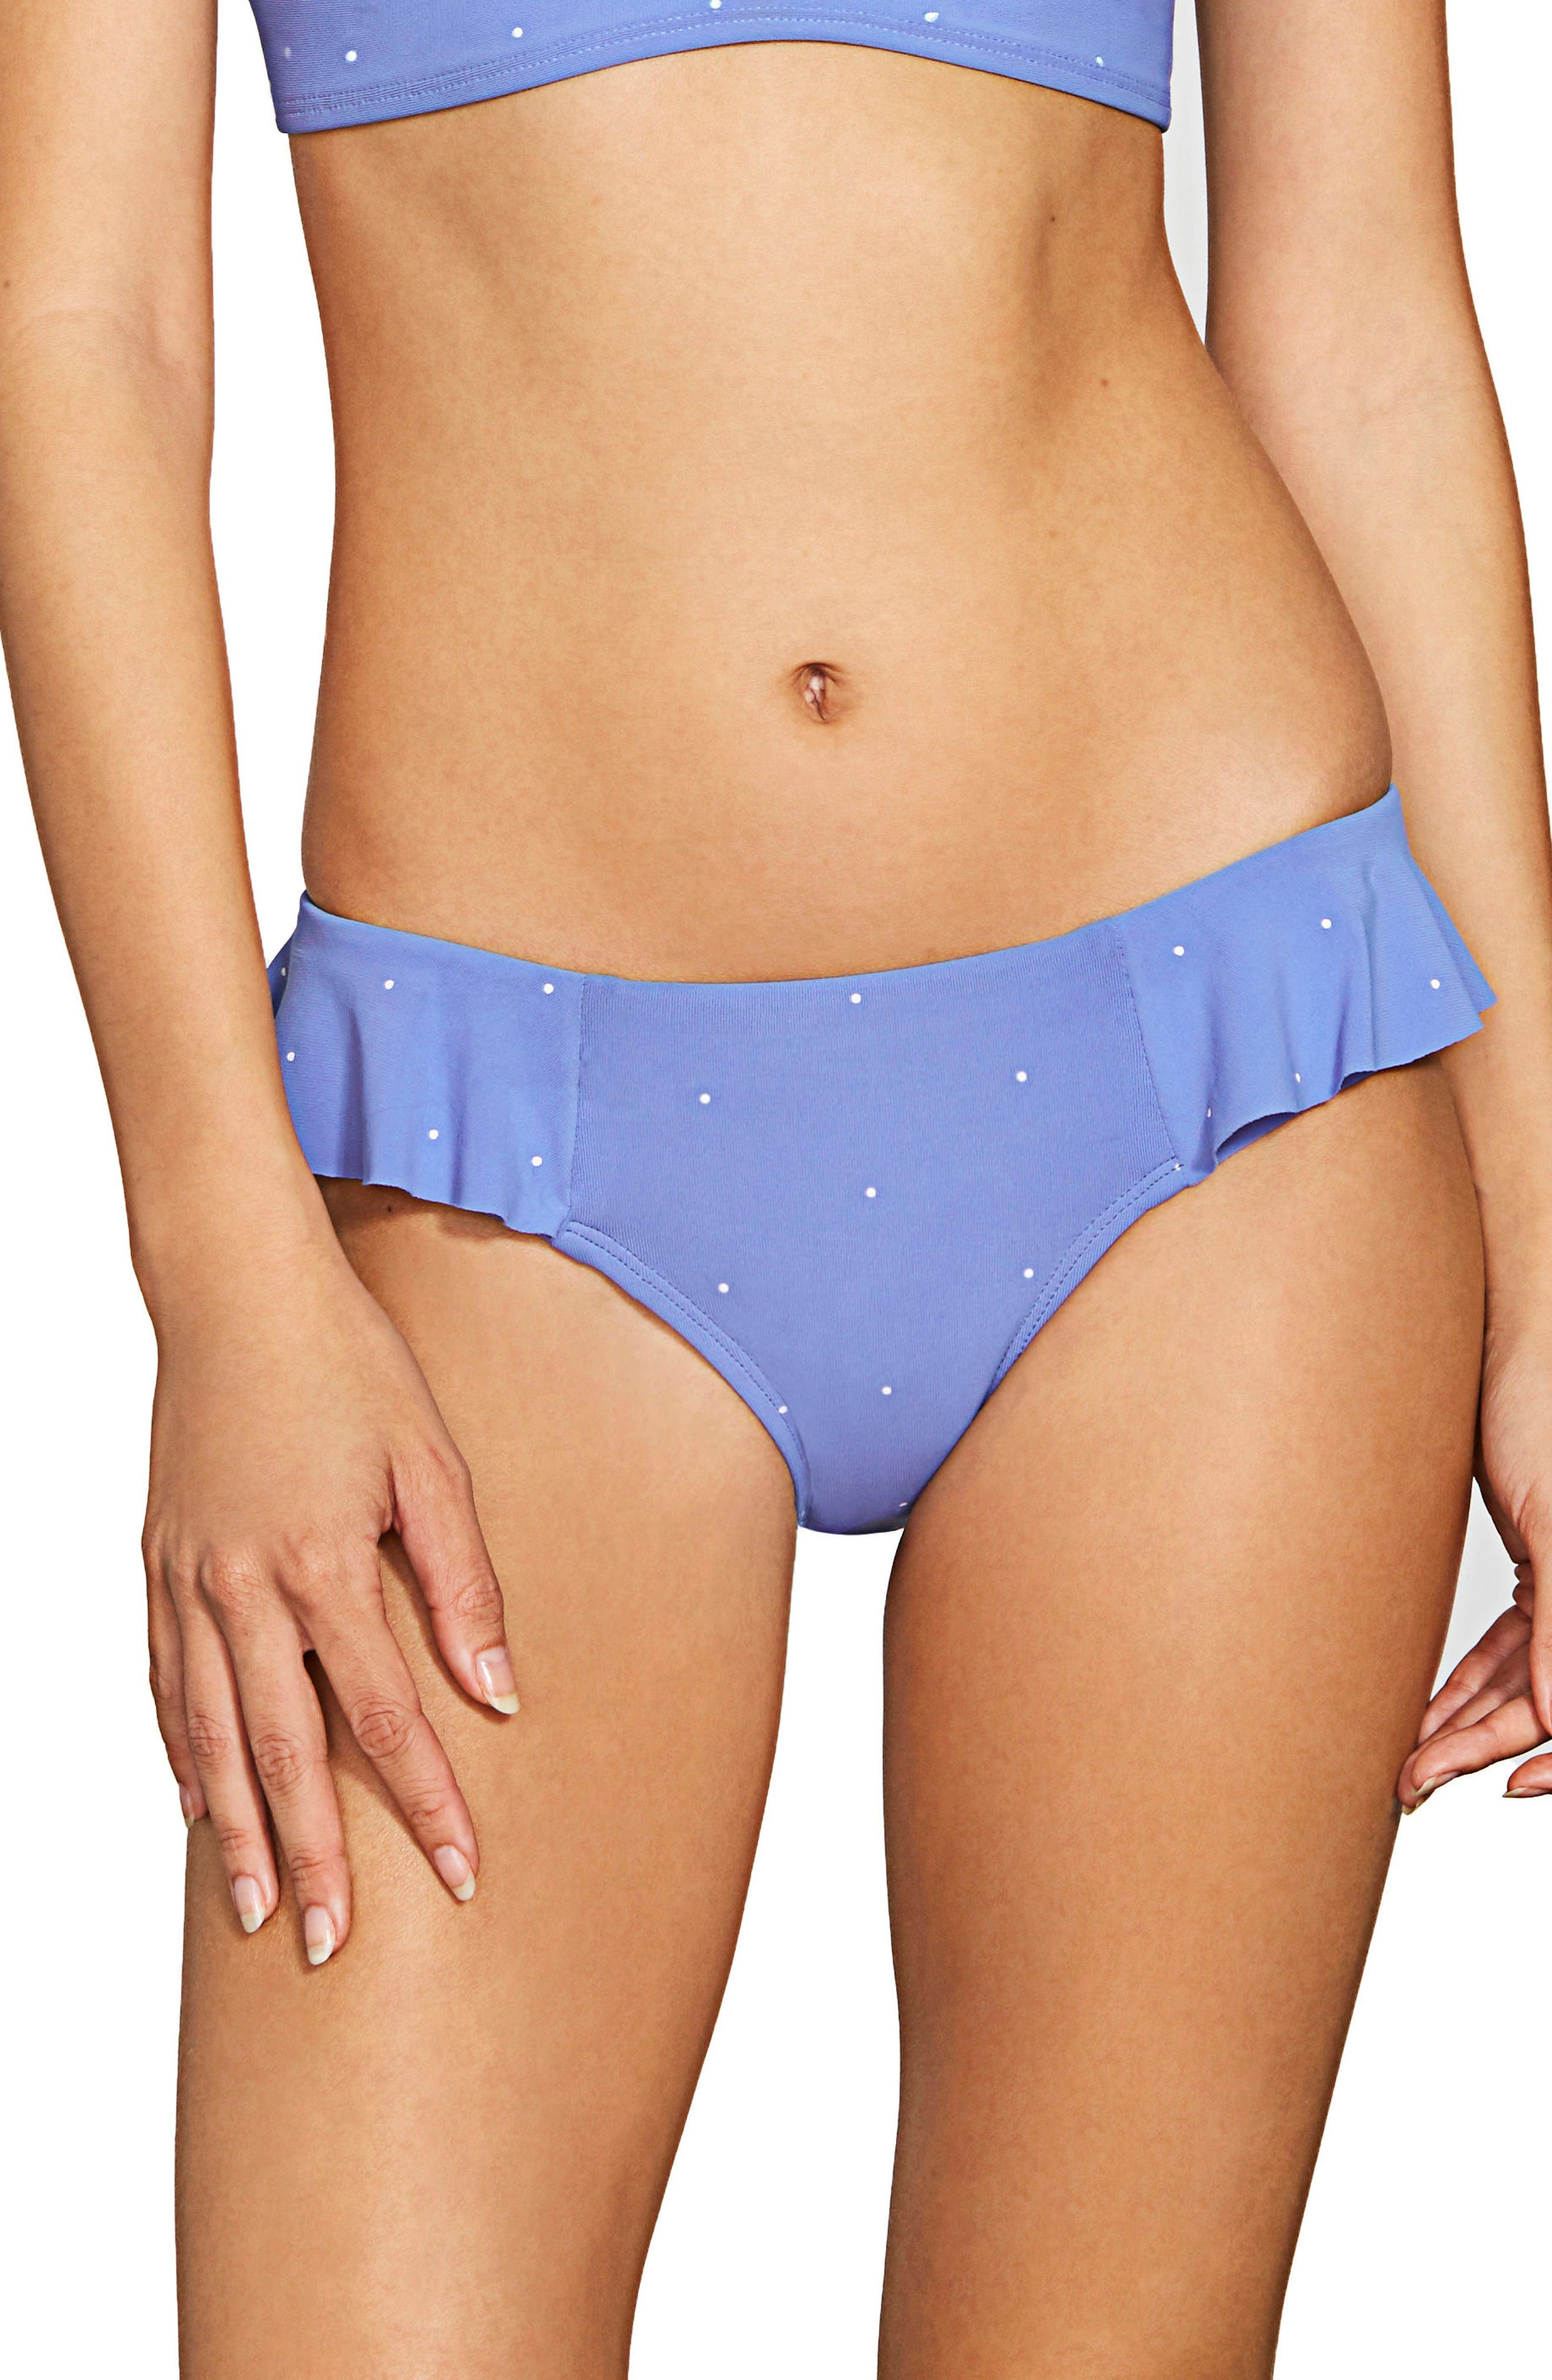 Jennie Ruffle Bikini Bottoms,                             Main thumbnail 1, color,                             PERIWINKLE